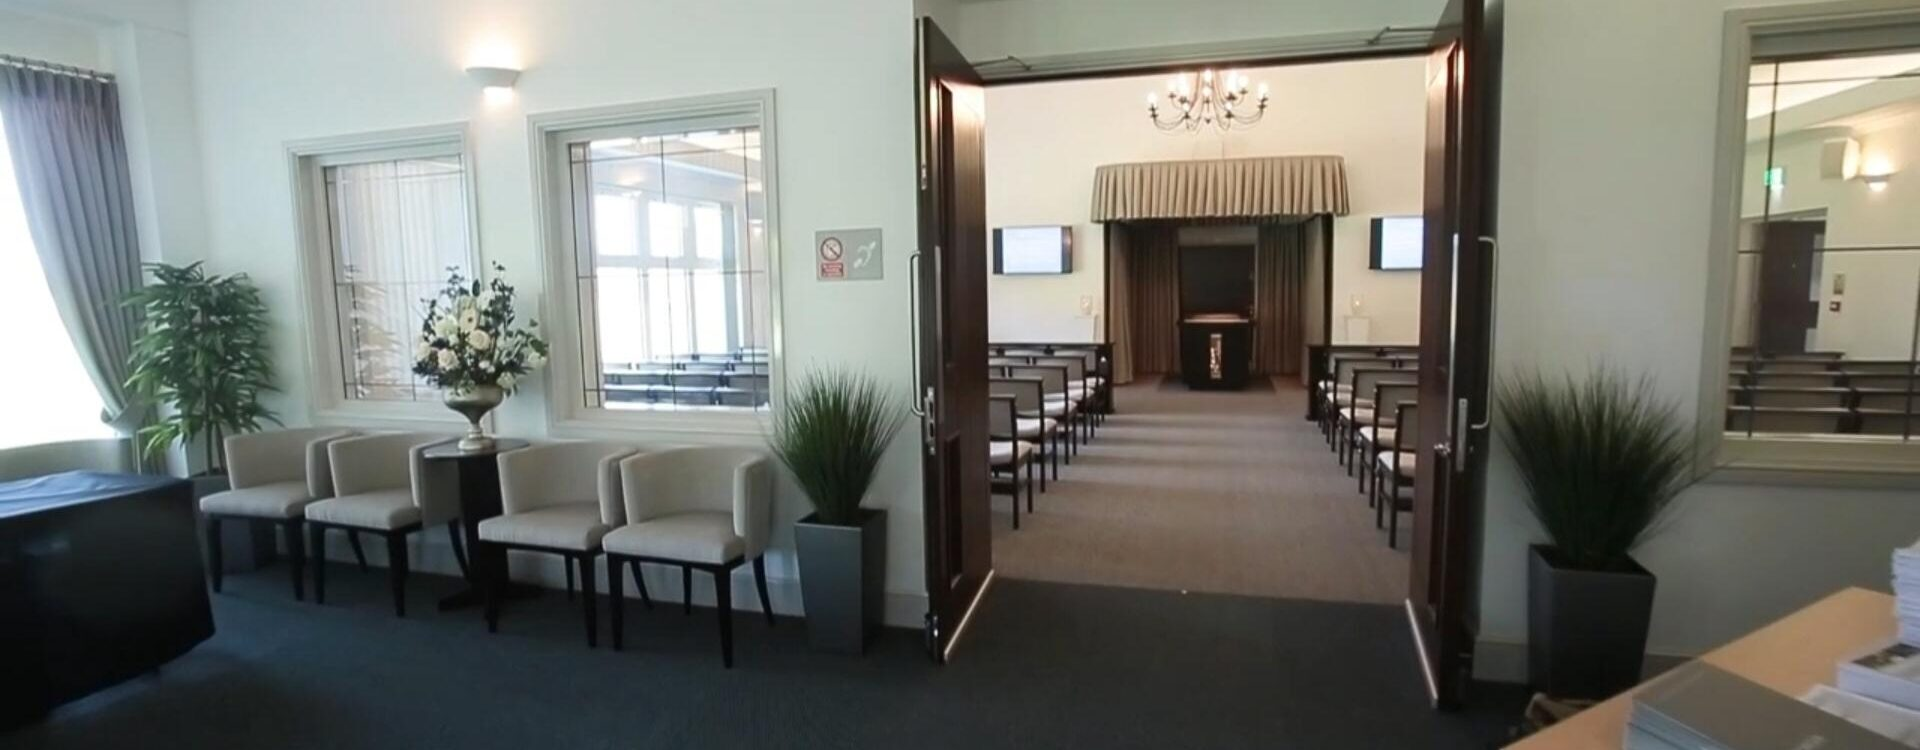 Flintshire Lobby